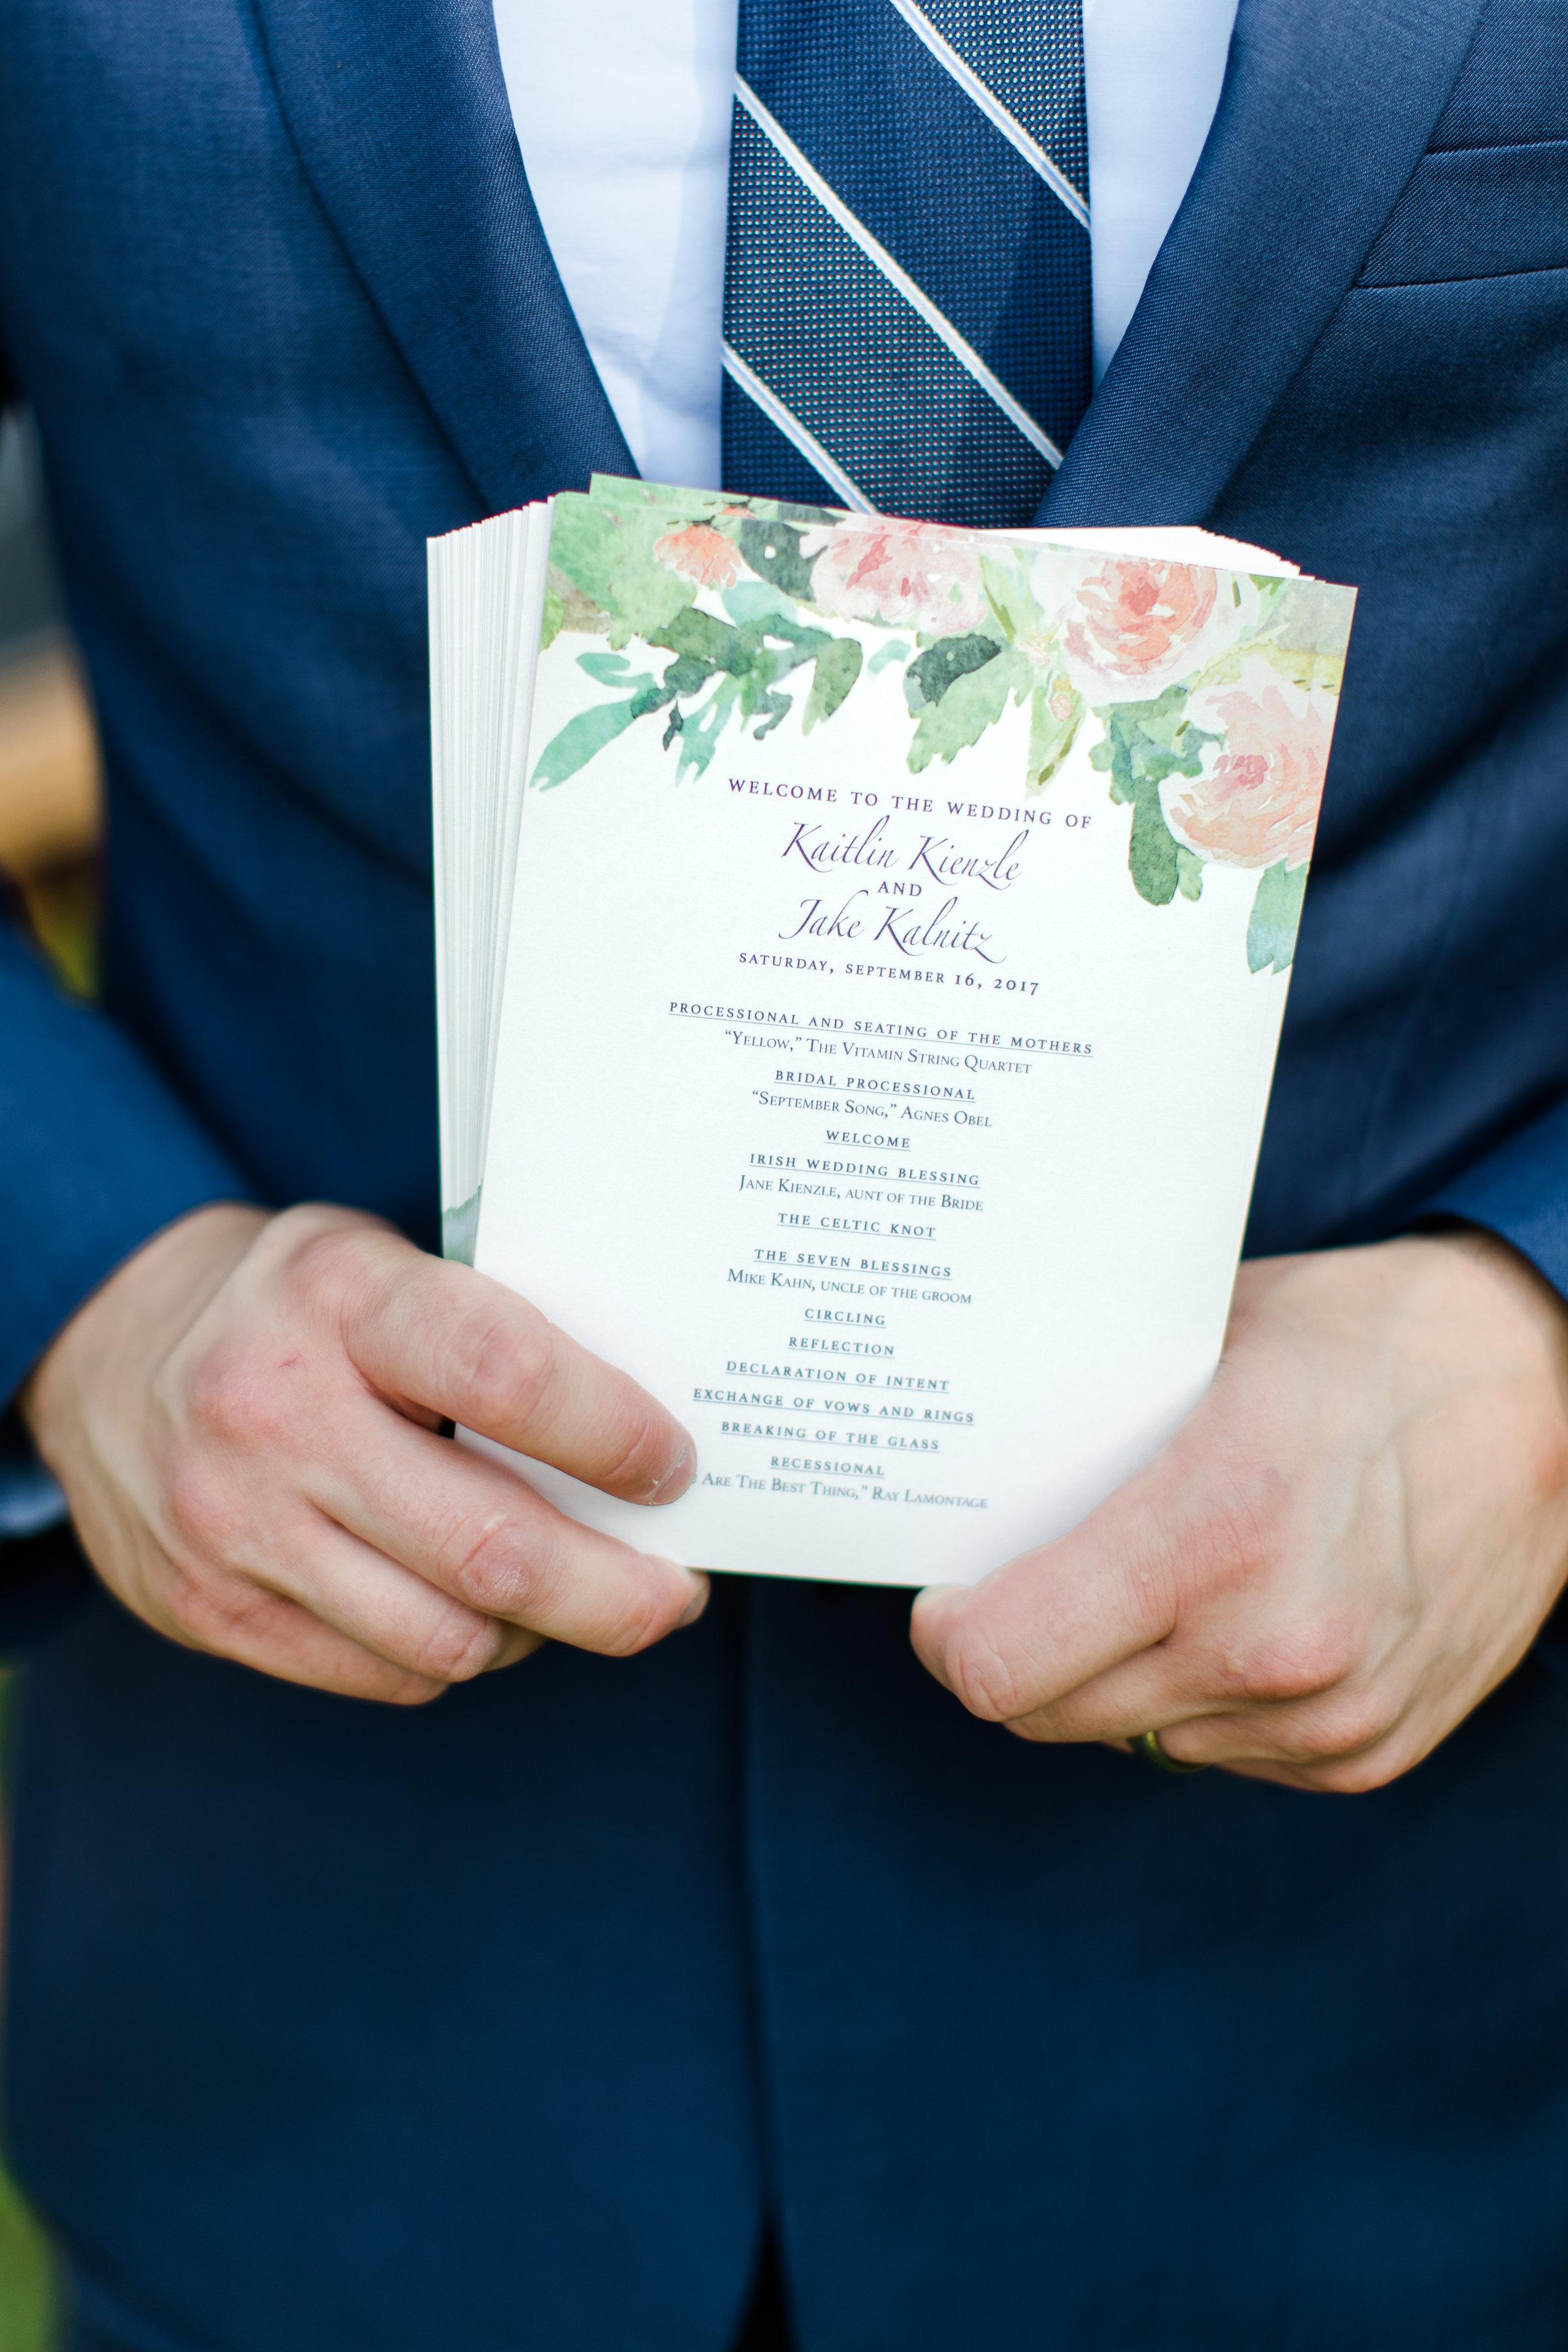 Bespoke 12 Corners Vineyard Wedding Program in Watercolor, Michigan. 2017. Photo by  Rebekah Albaugh .